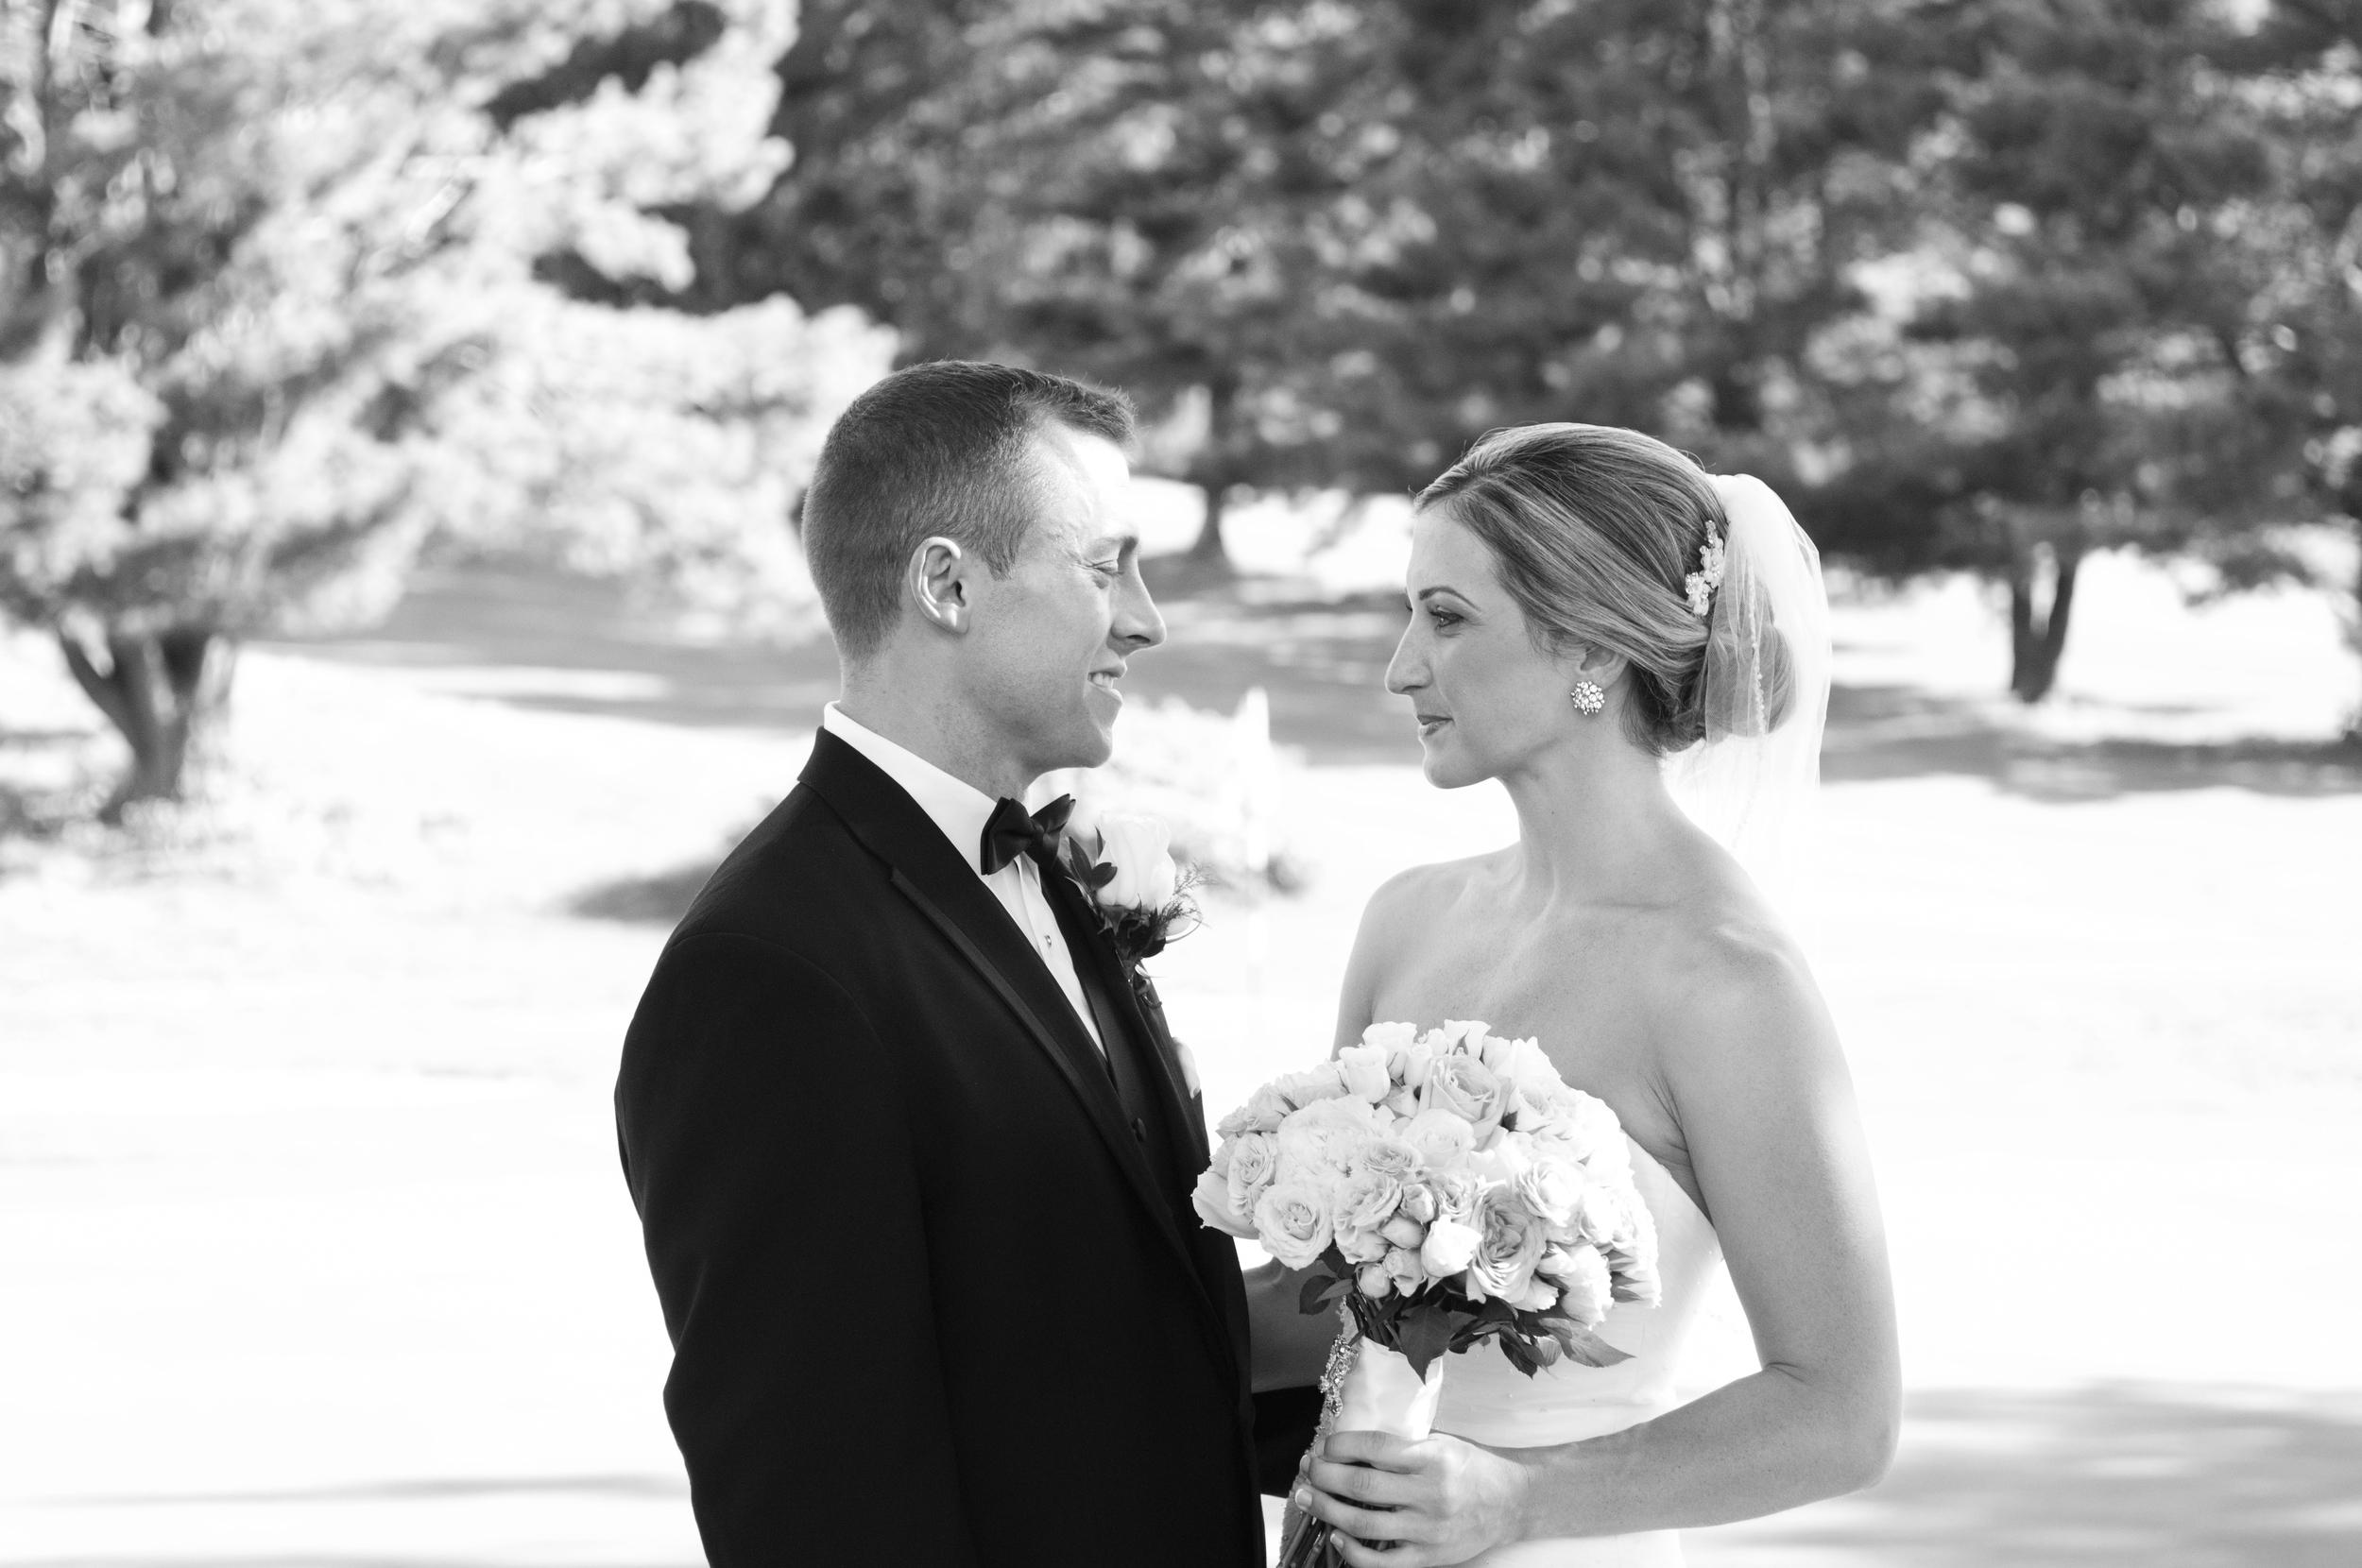 Angela_Chicoski_CT_wedding_photographer_094.jpg